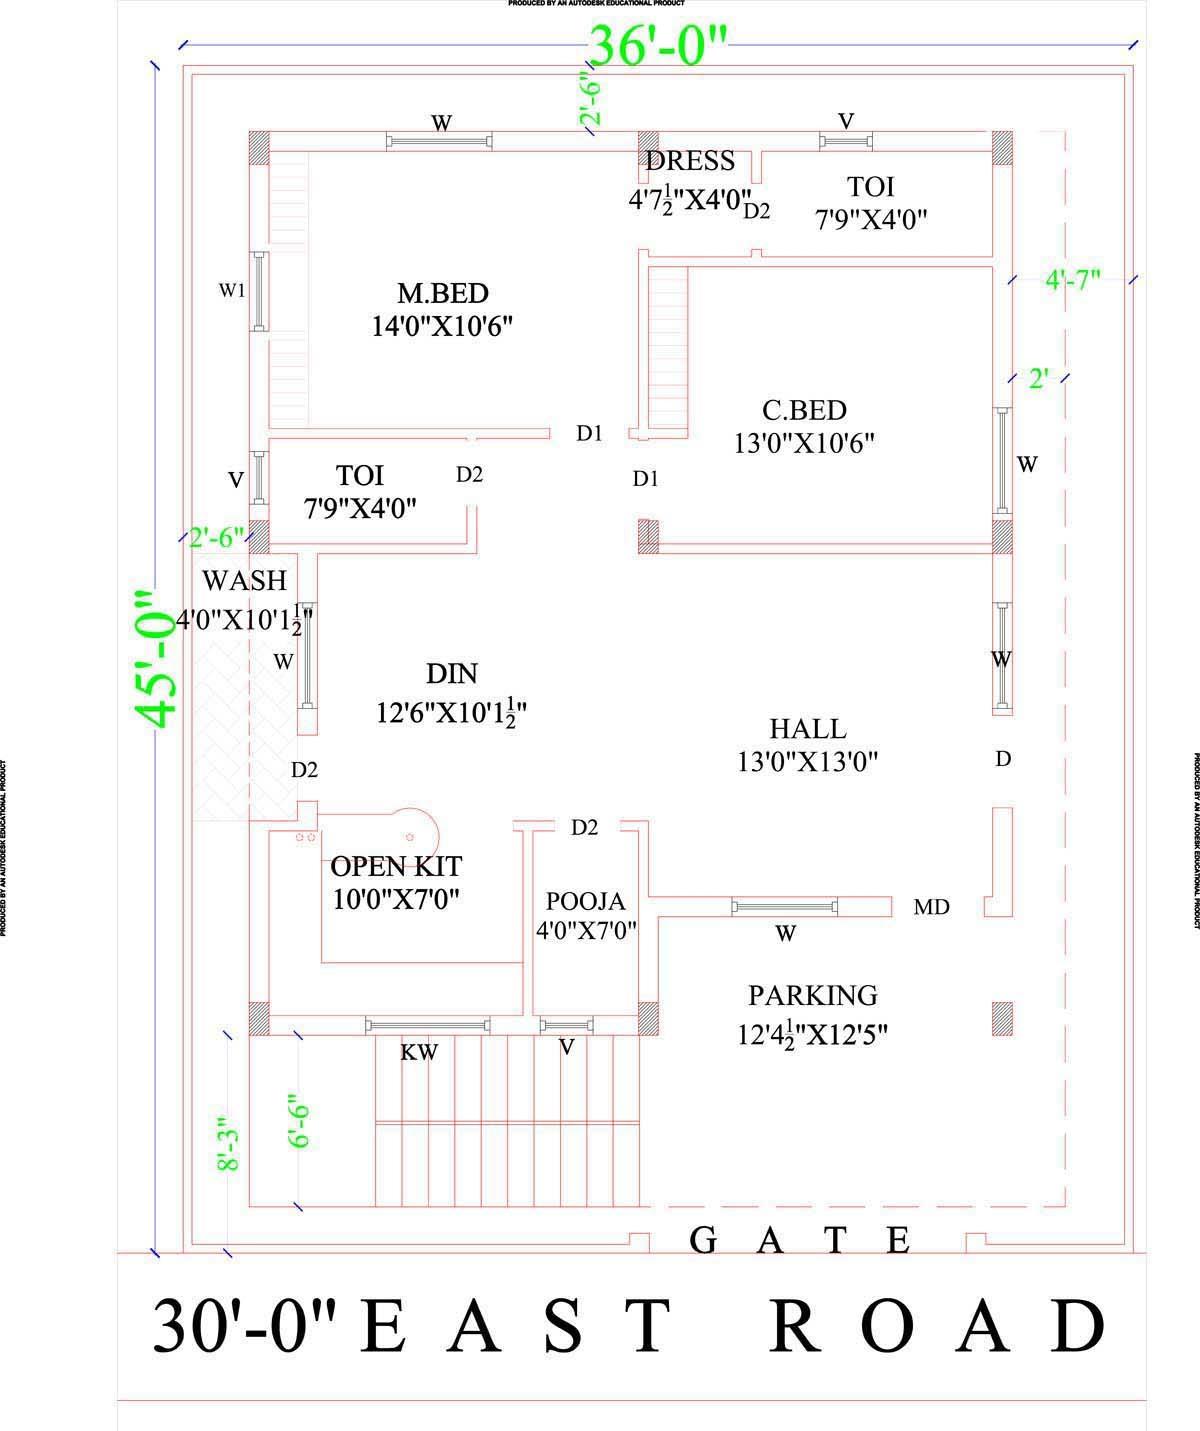 Amusing 200 Sq Yard House Plans India Gallery Image design house – 200 Sq Ft House Plans India